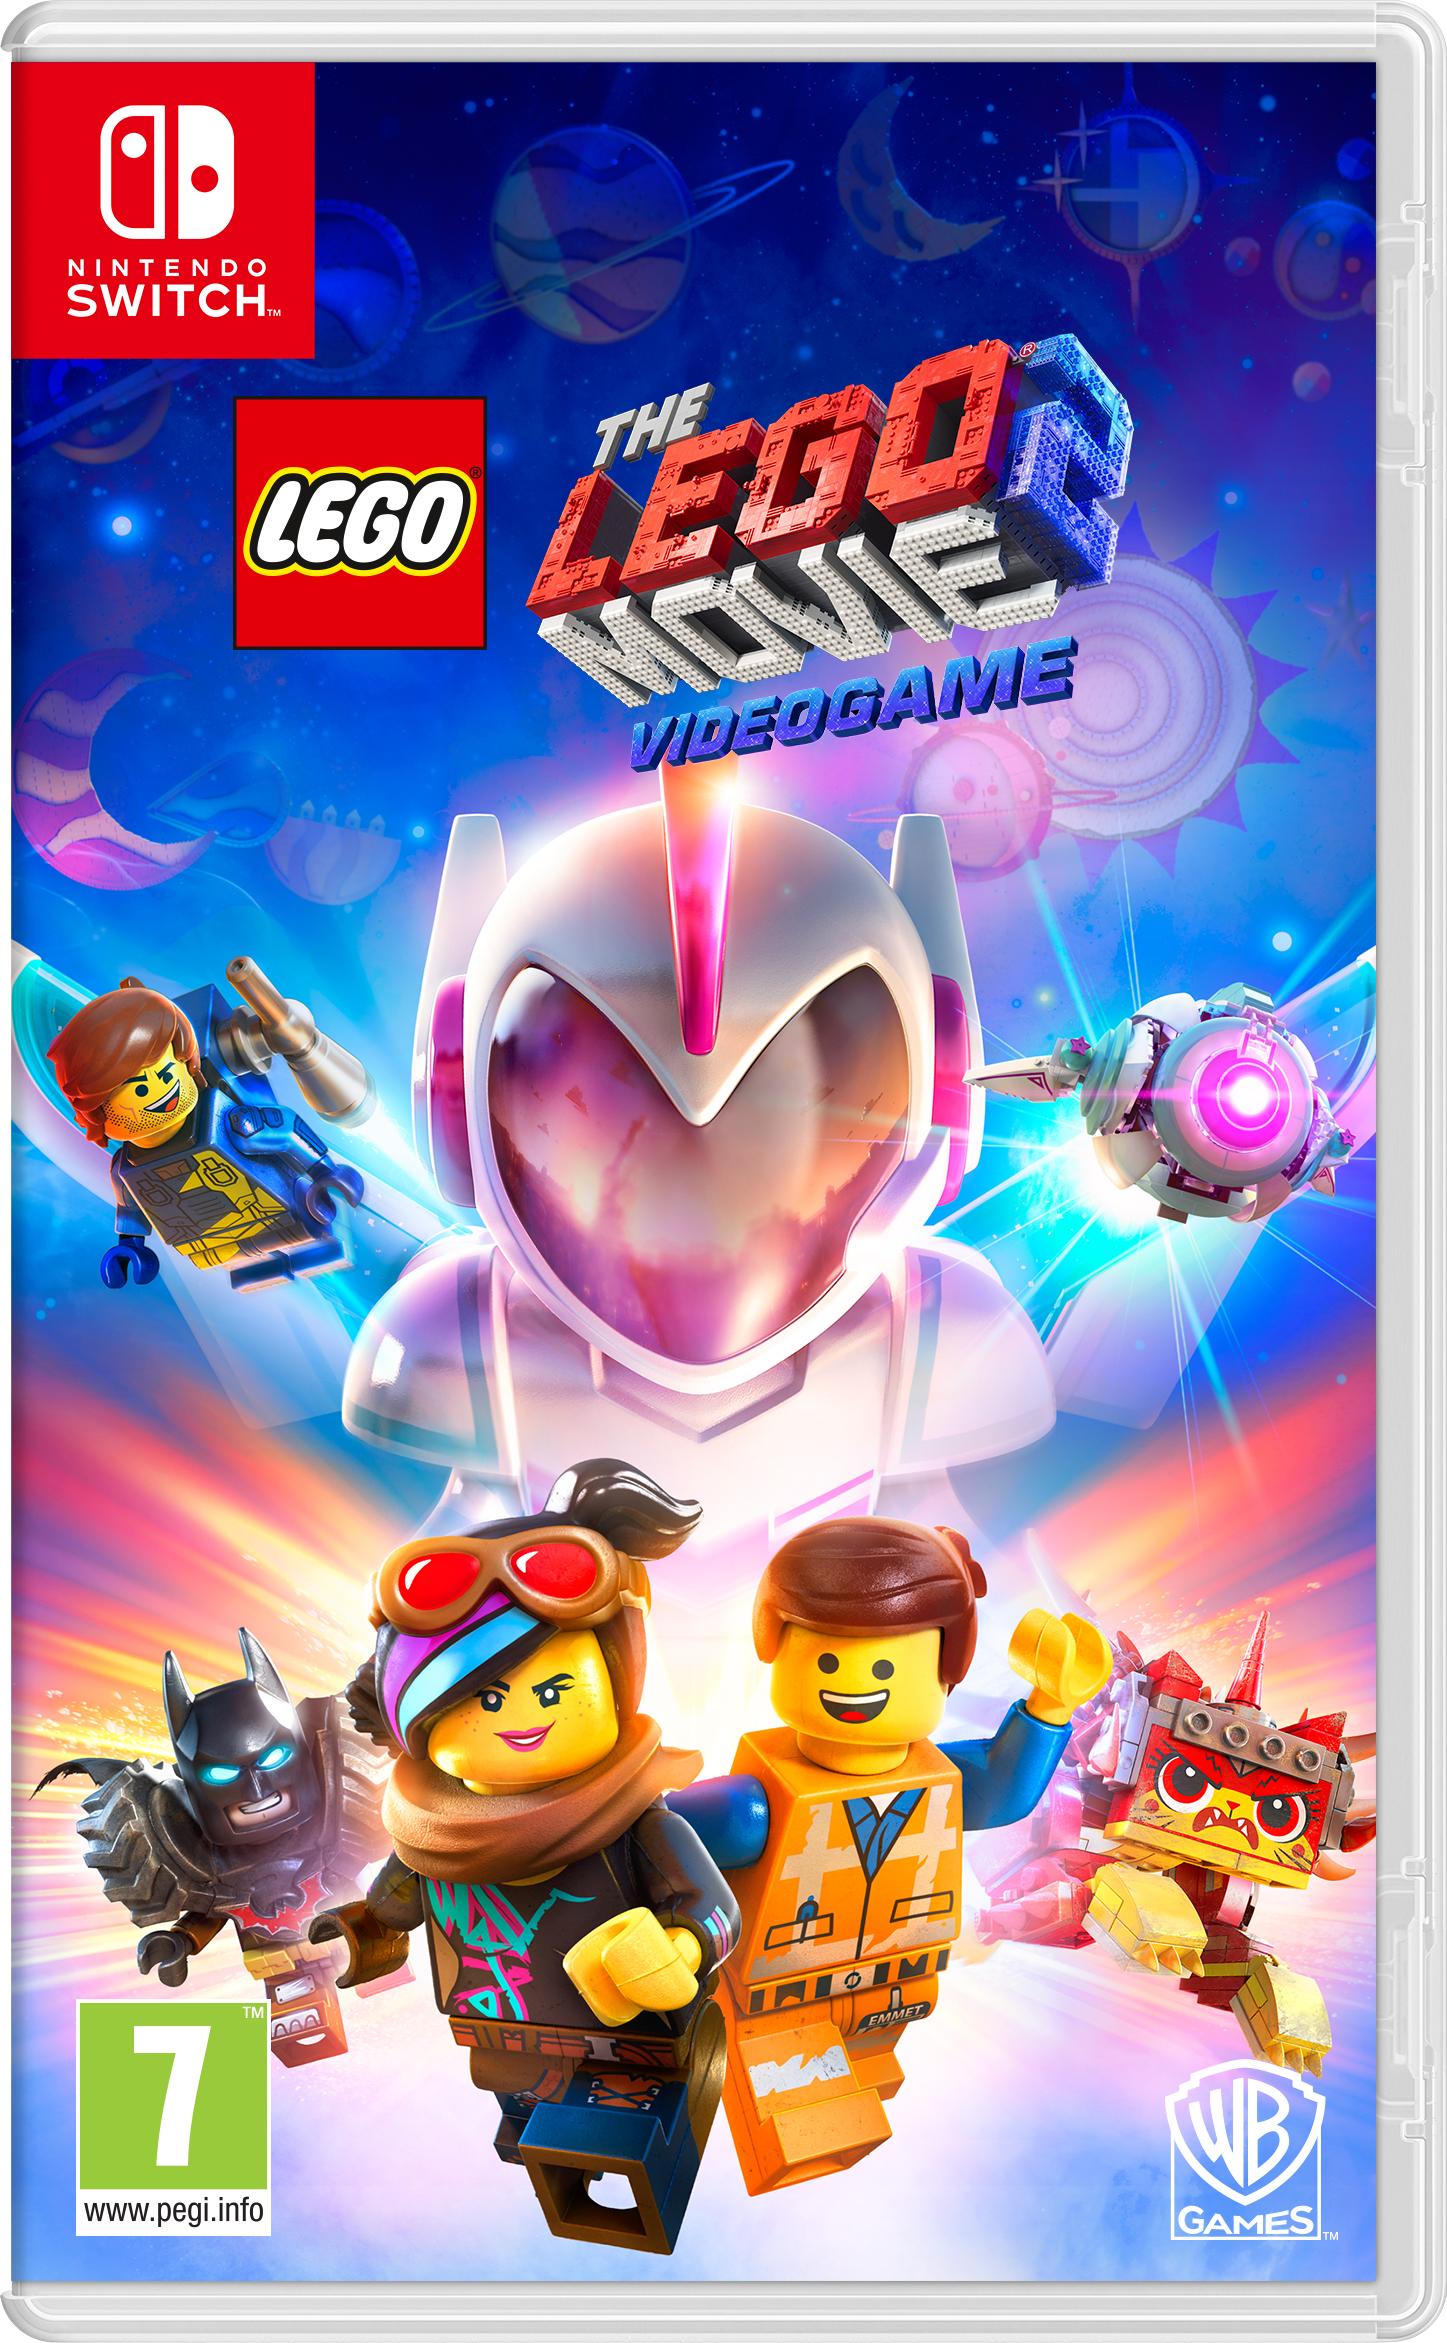 Warner Bros Lego Movie 2 The LEGO Movie 2 - 1000740123